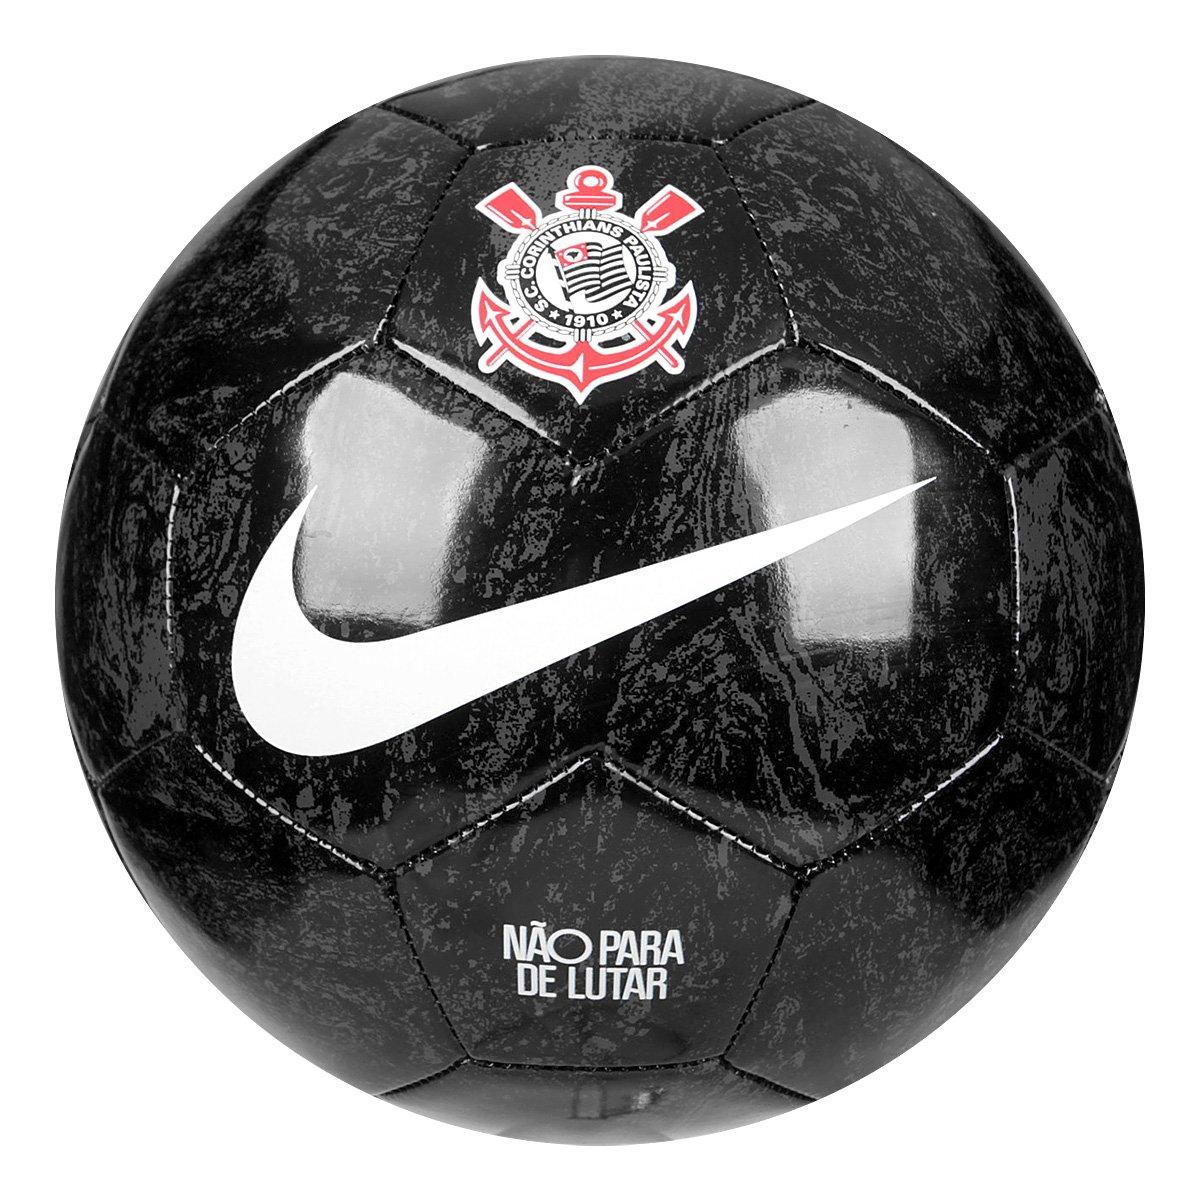 Bola de Futebol Campo Nike Corinthians - Preto e Branco - Compre ... ec5bc3e8b77d4